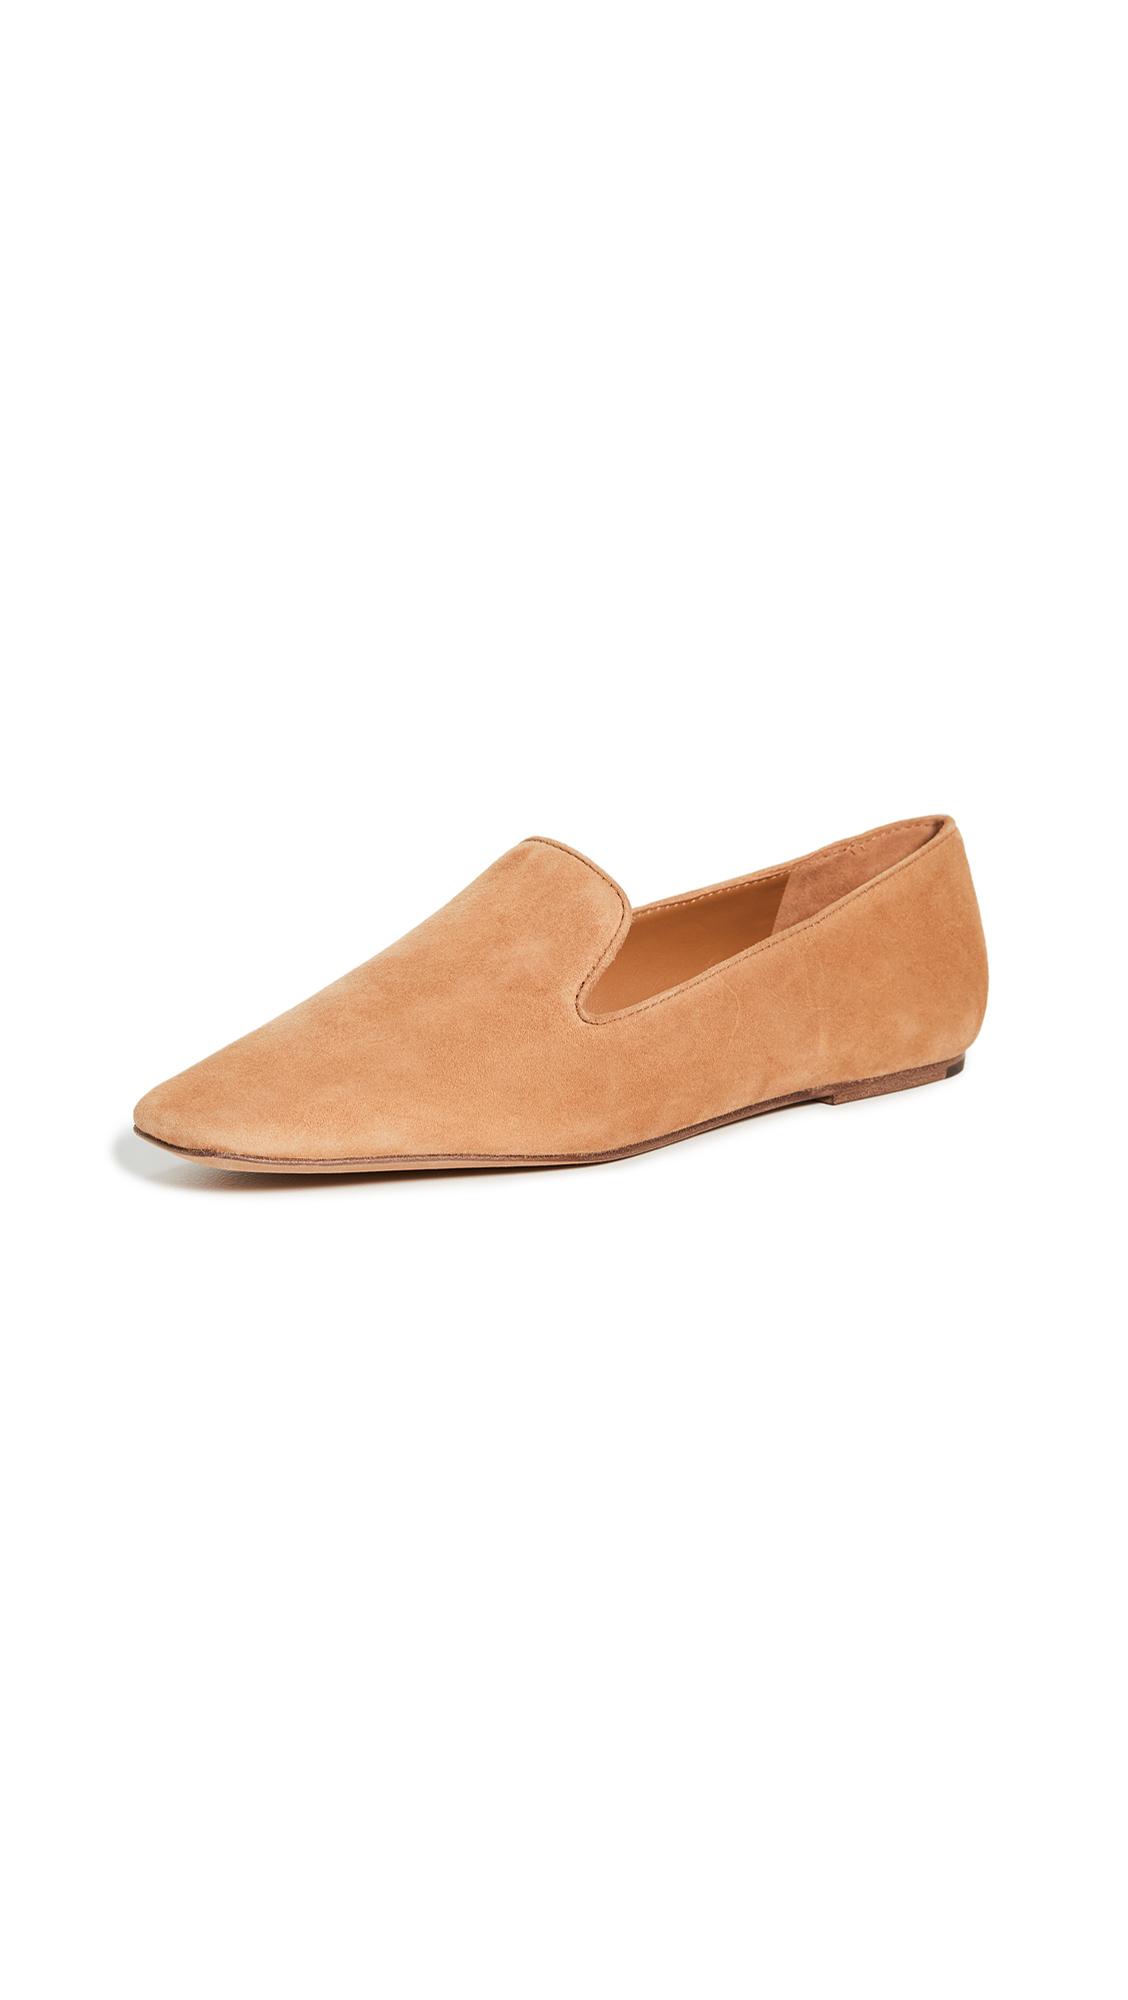 Vince Clark Loafers – 50% Off Sale